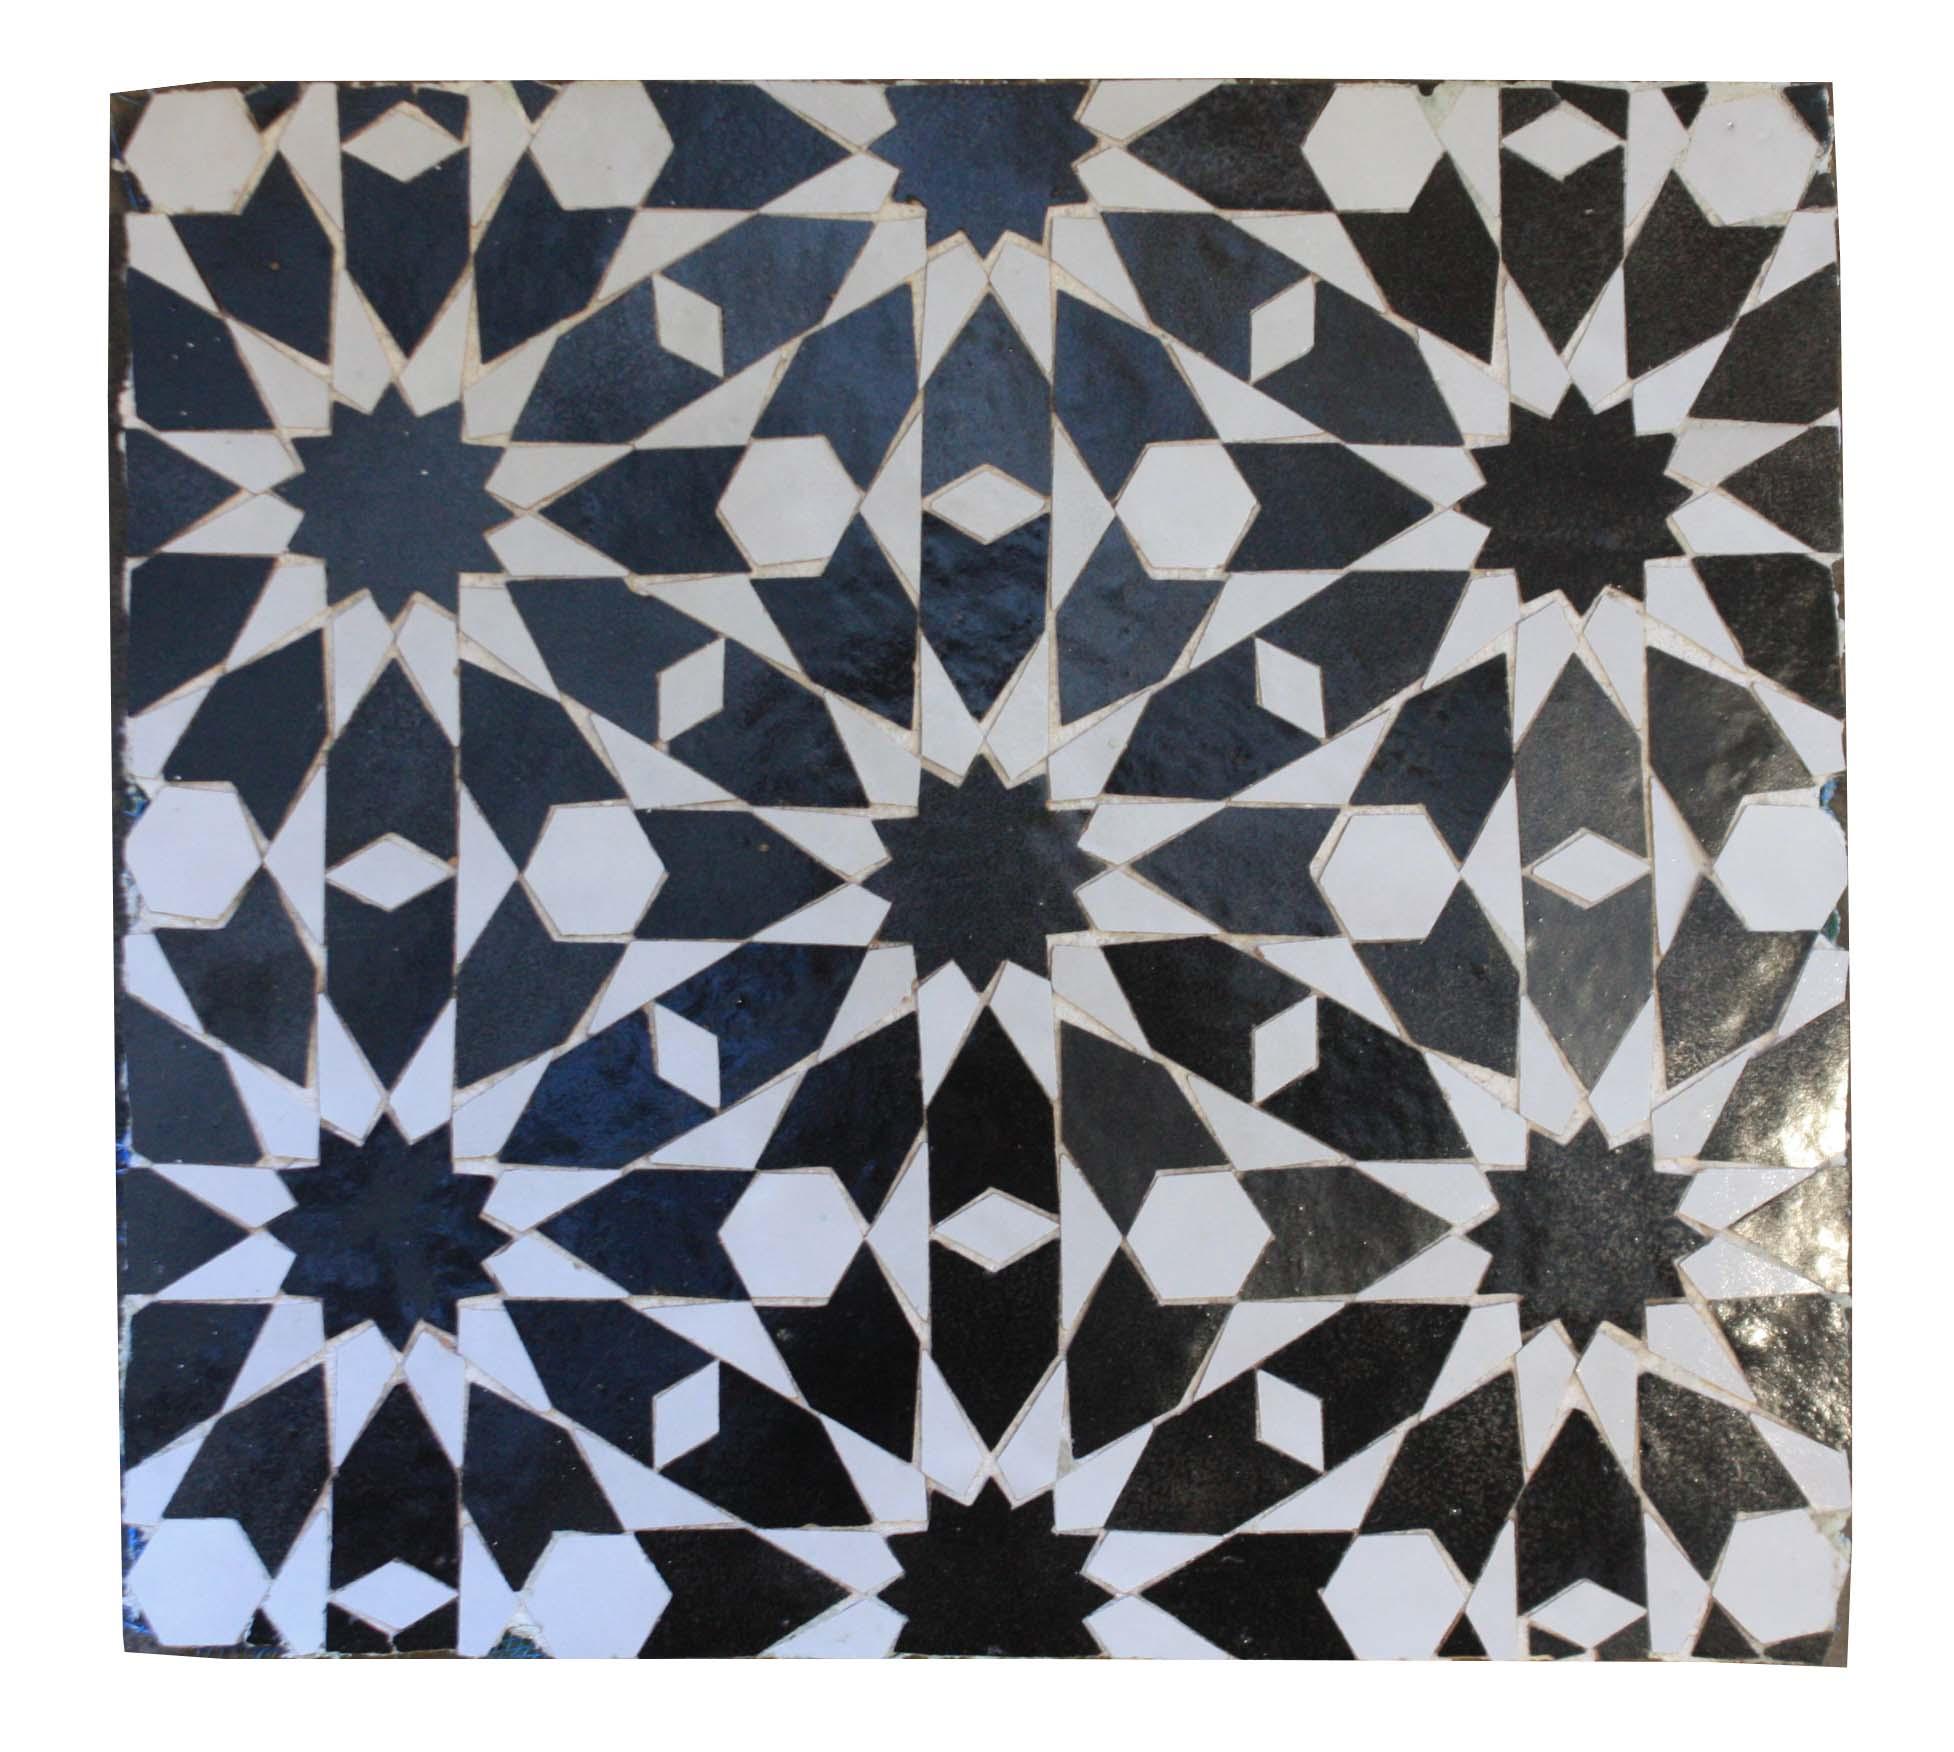 moroccan-mosaic-cement-tile-tm062.jpg